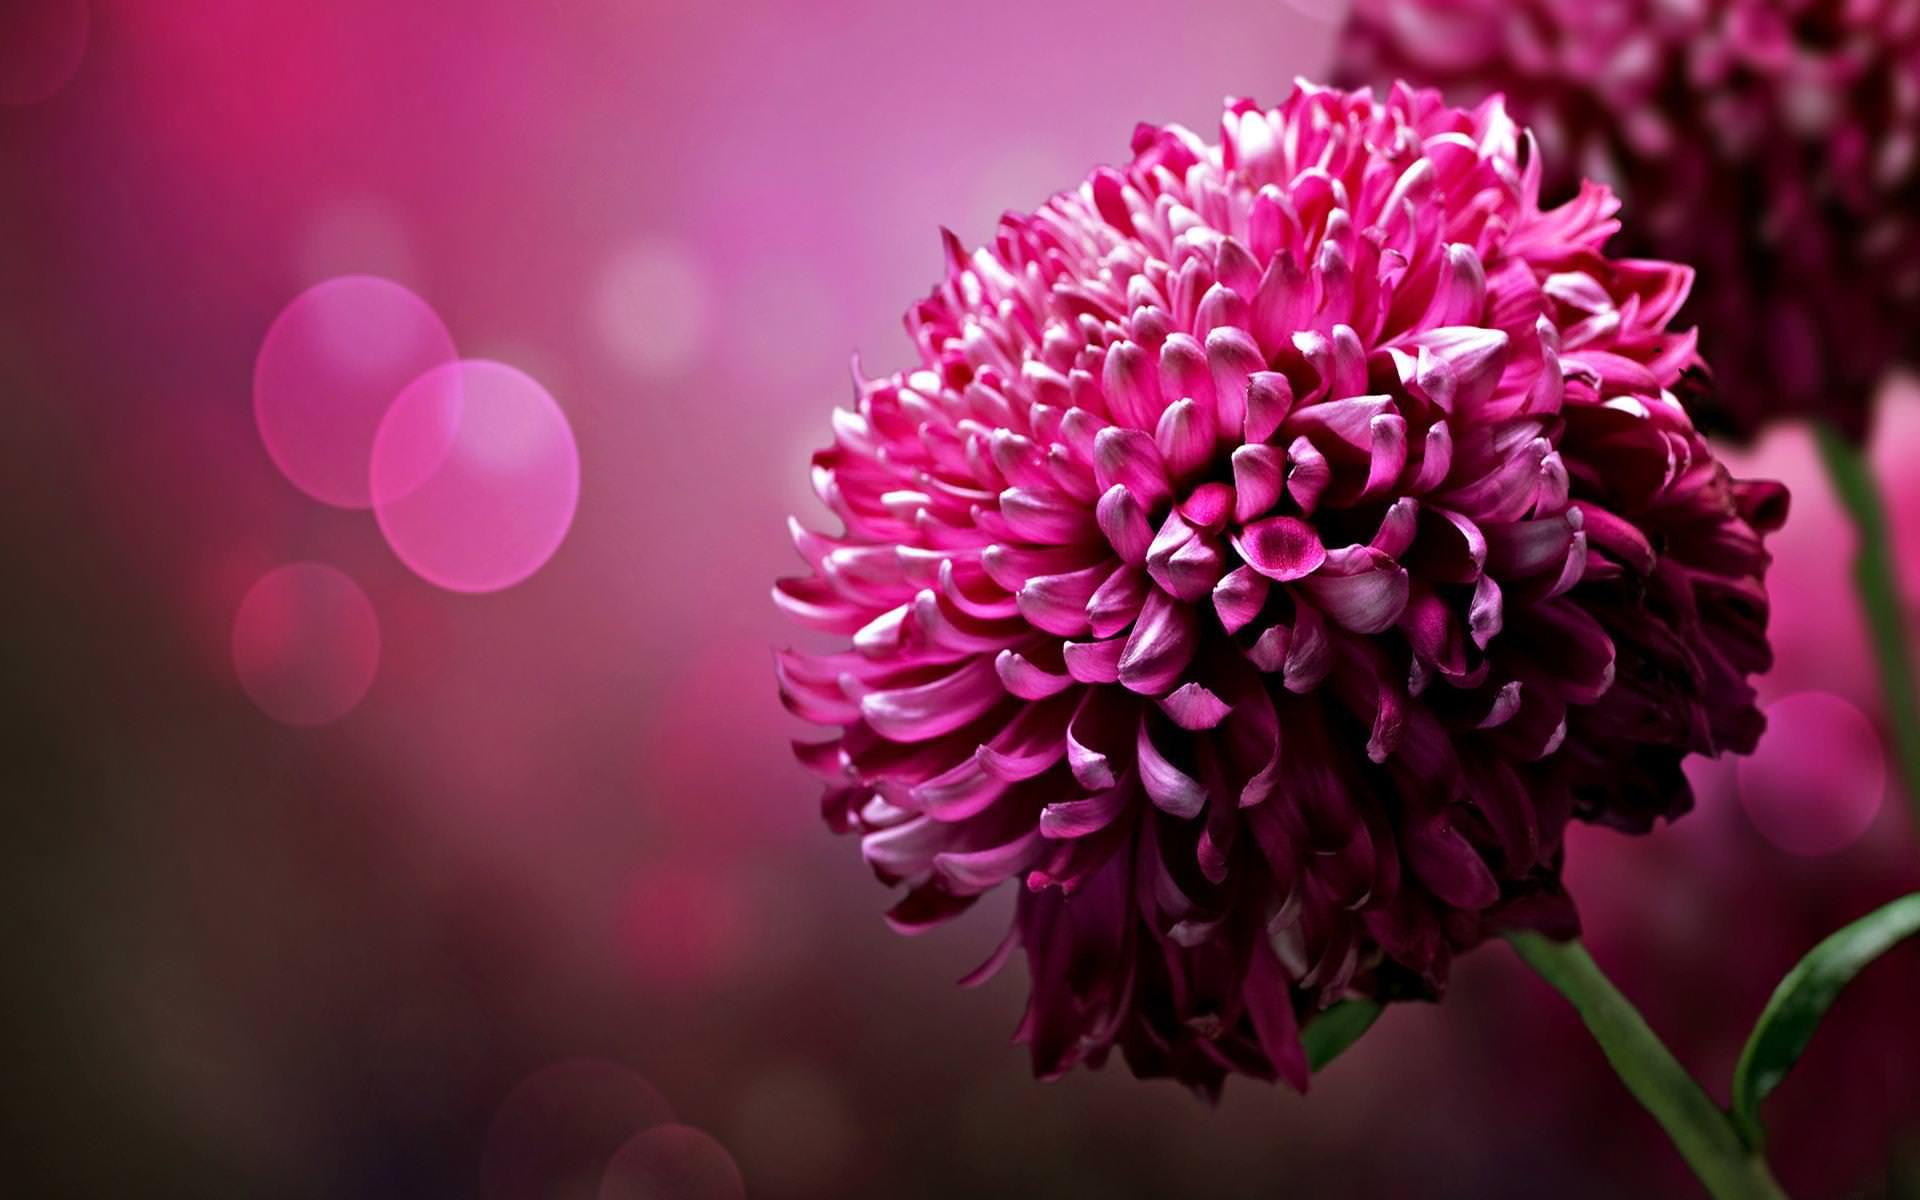 Desktop Flower Background